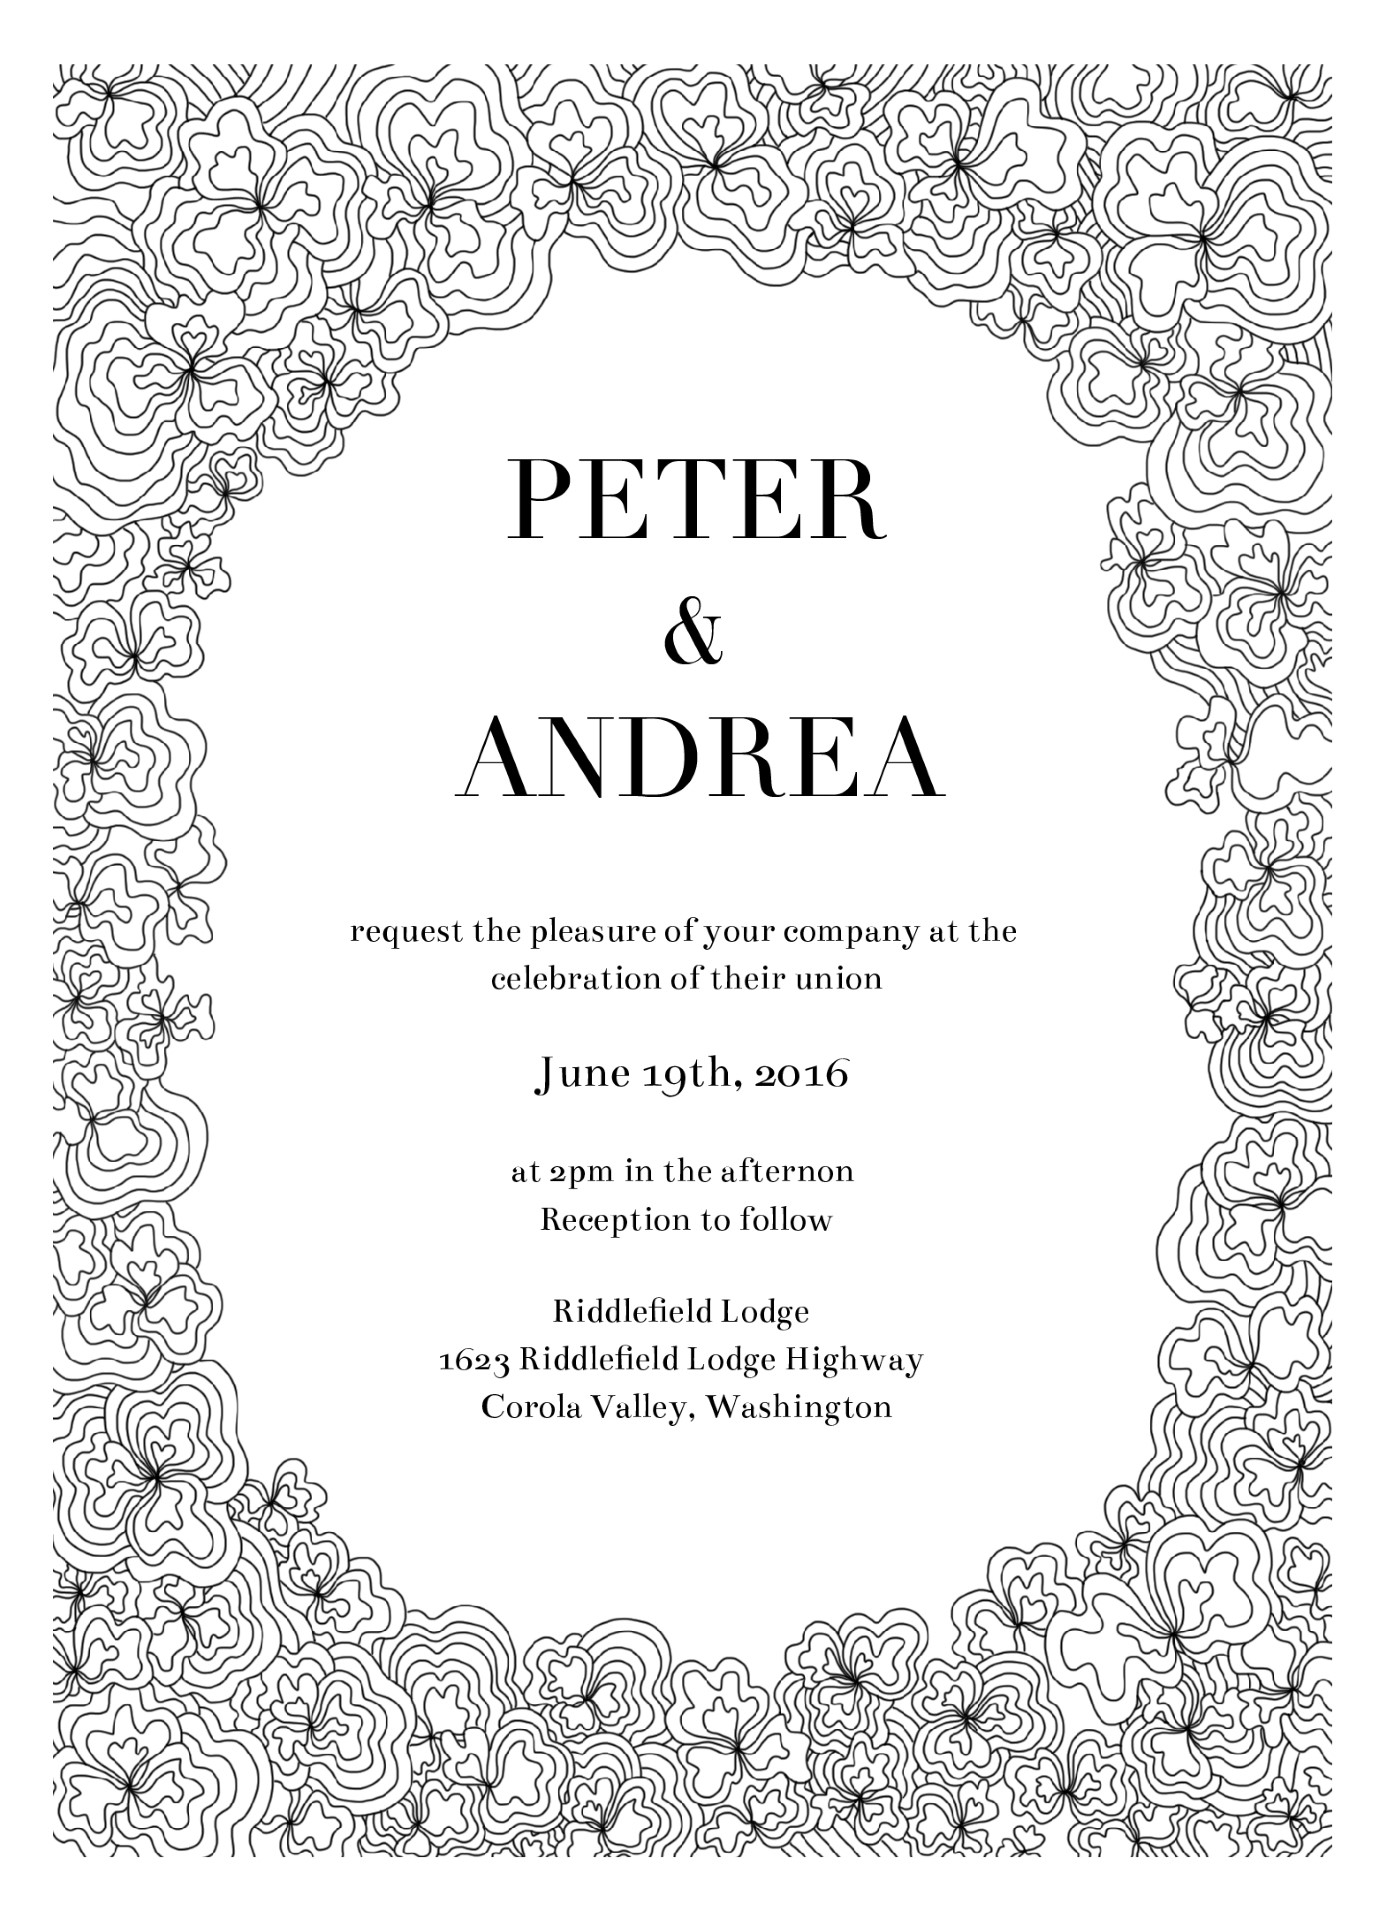 Doodle - Invitations